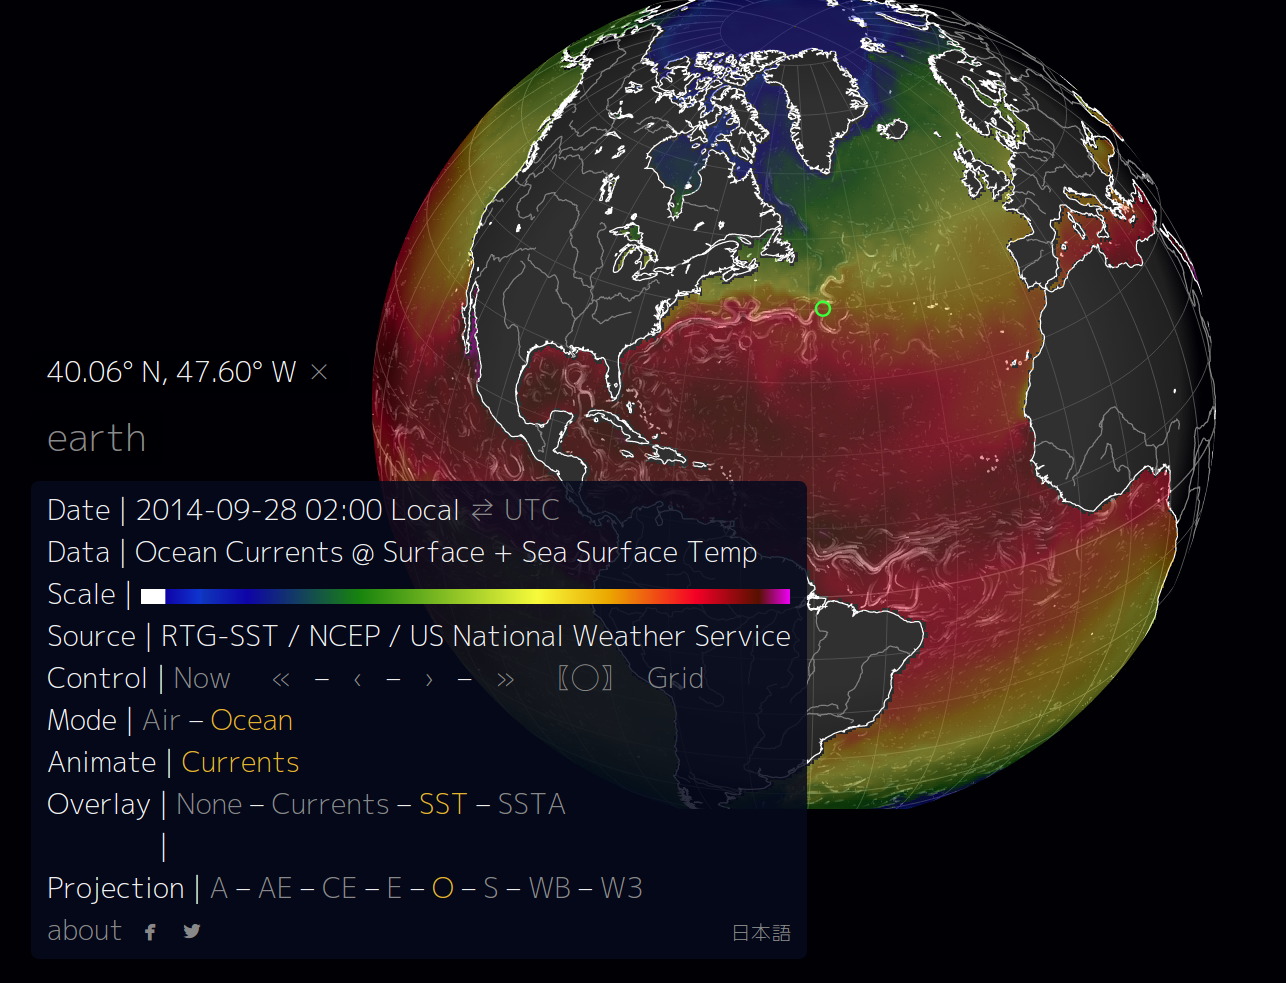 Earth Project - OceanDrivers